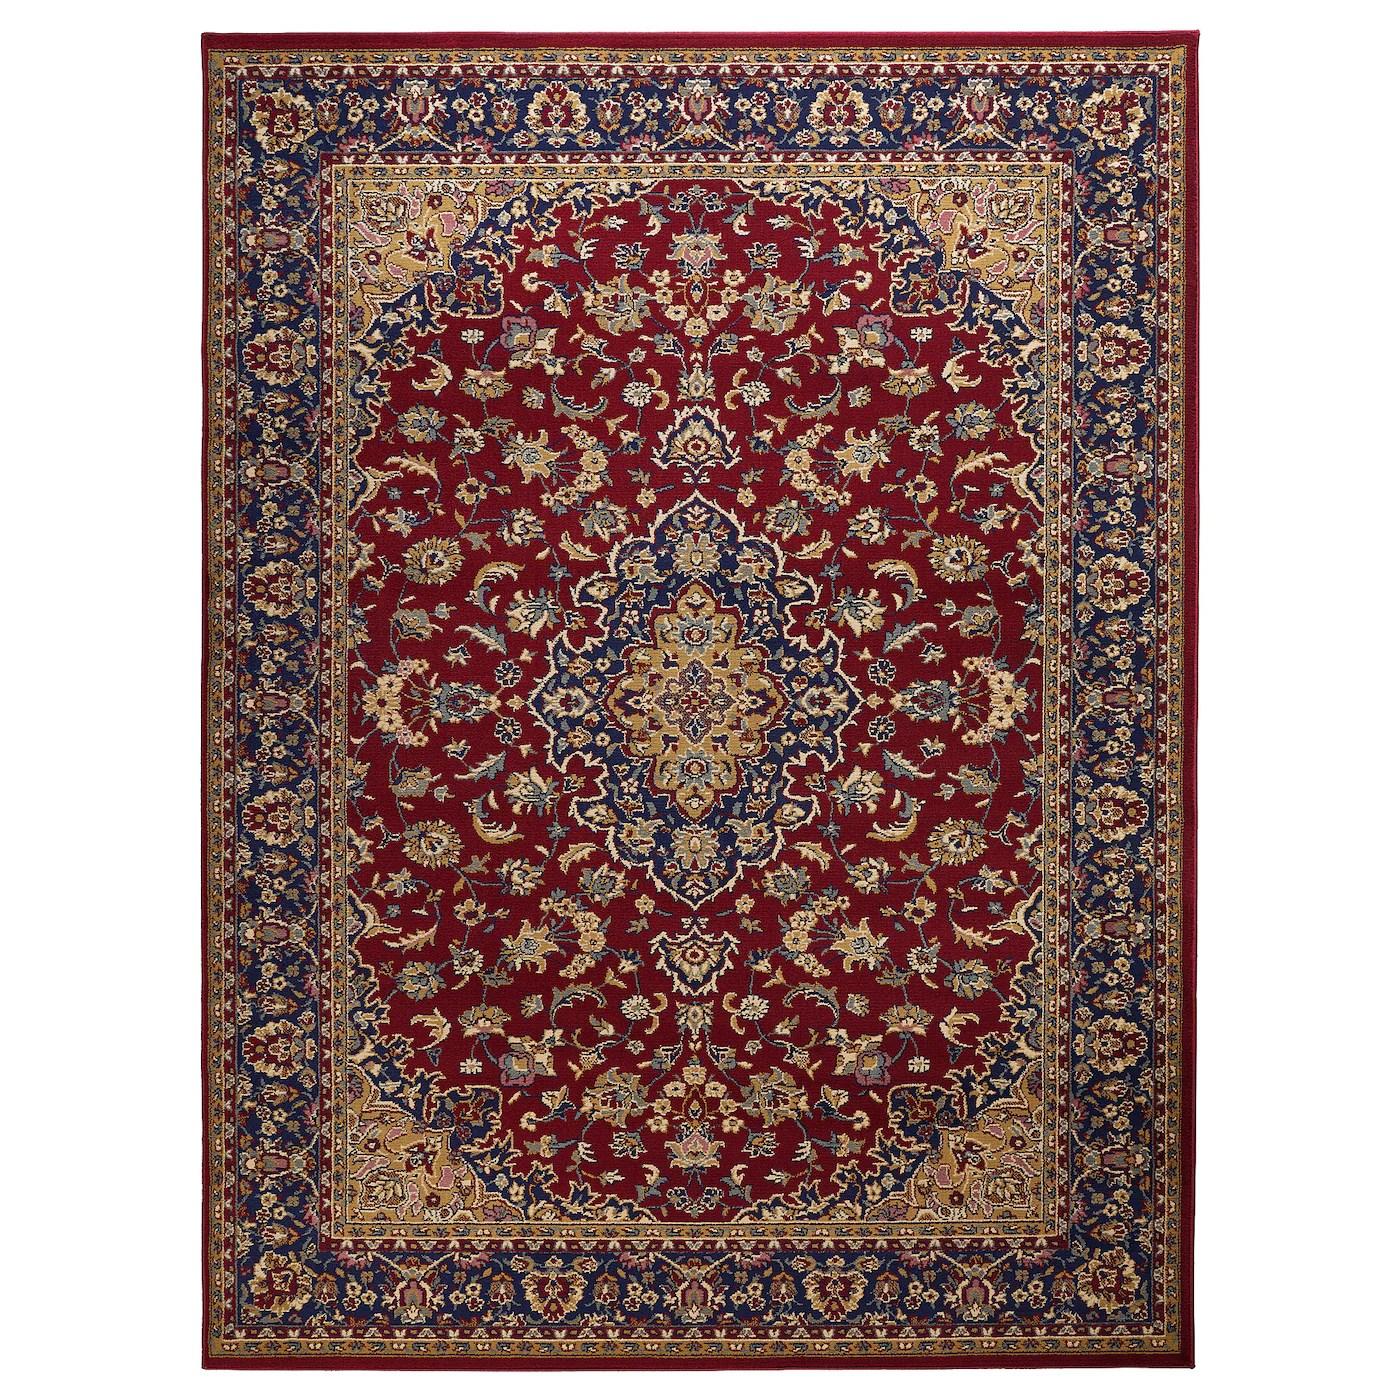 vedbak tapis poils ras multicolore 170x230 cm